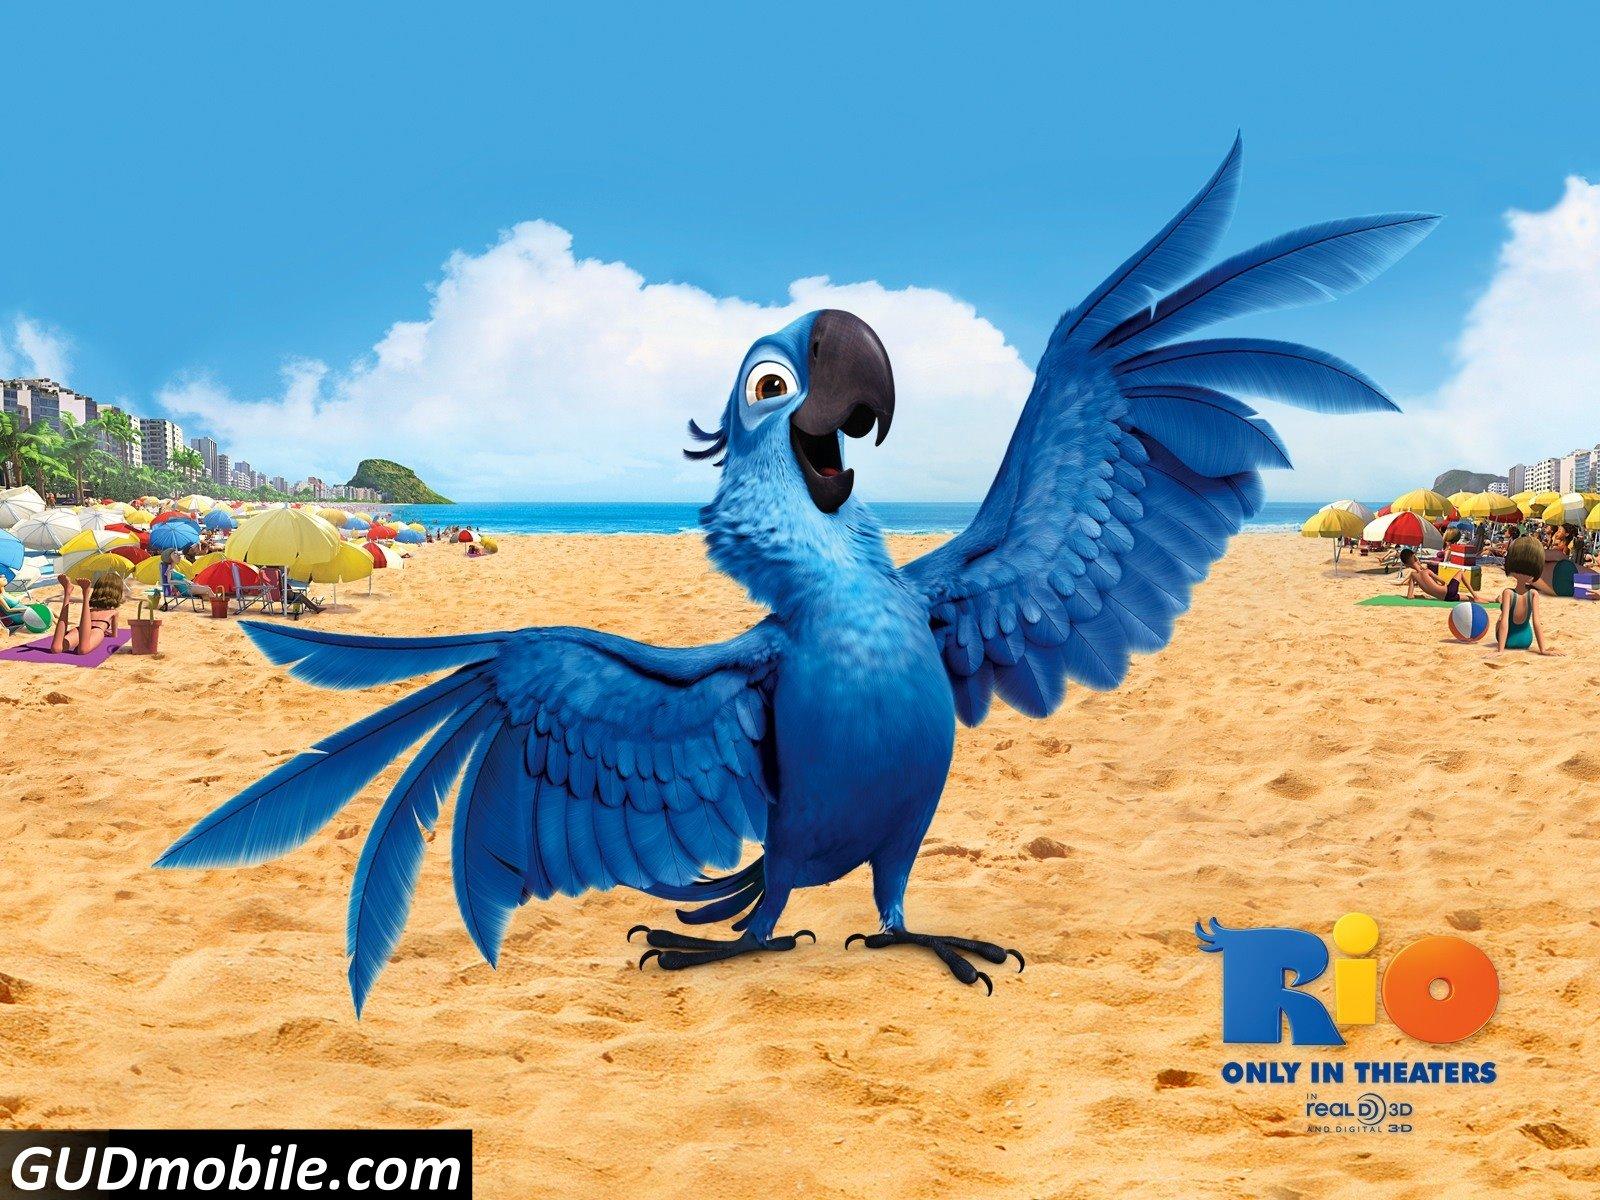 Wonderful Wallpaper High Resolution Movie - blu_bird_in_rio-1600x1200  Pic_637424.jpg